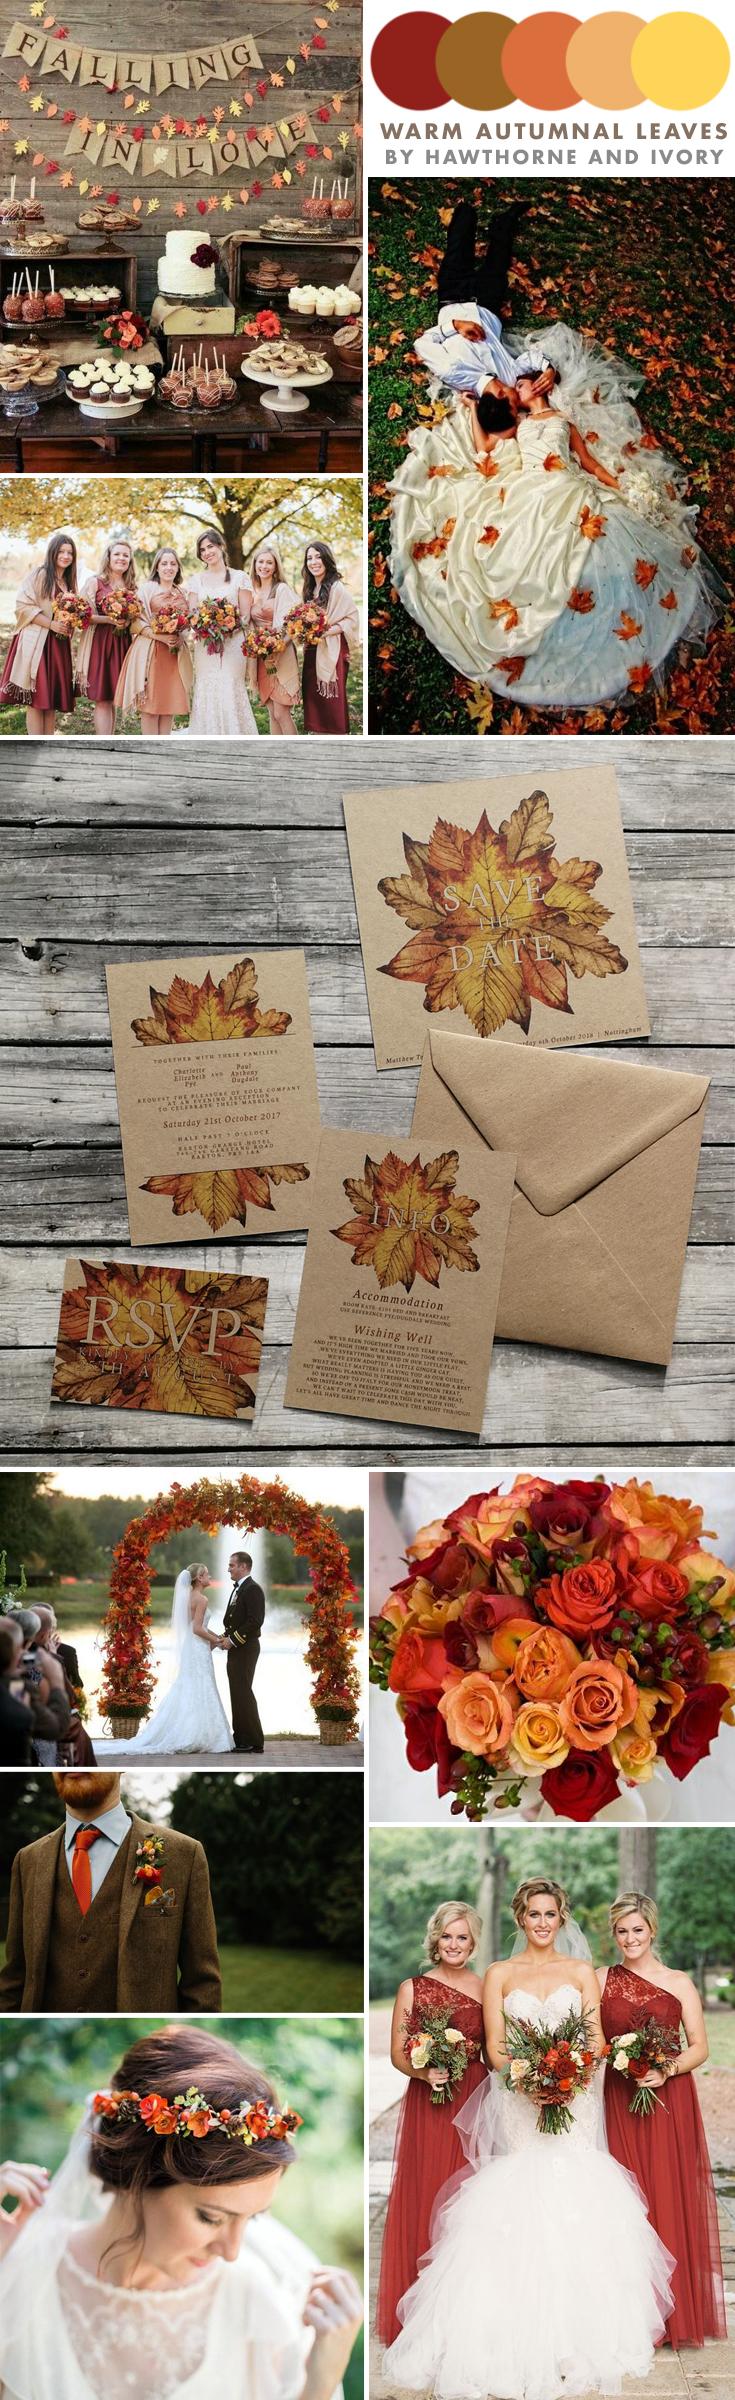 autumn leaves wedding moodboard hawthorne and ivory